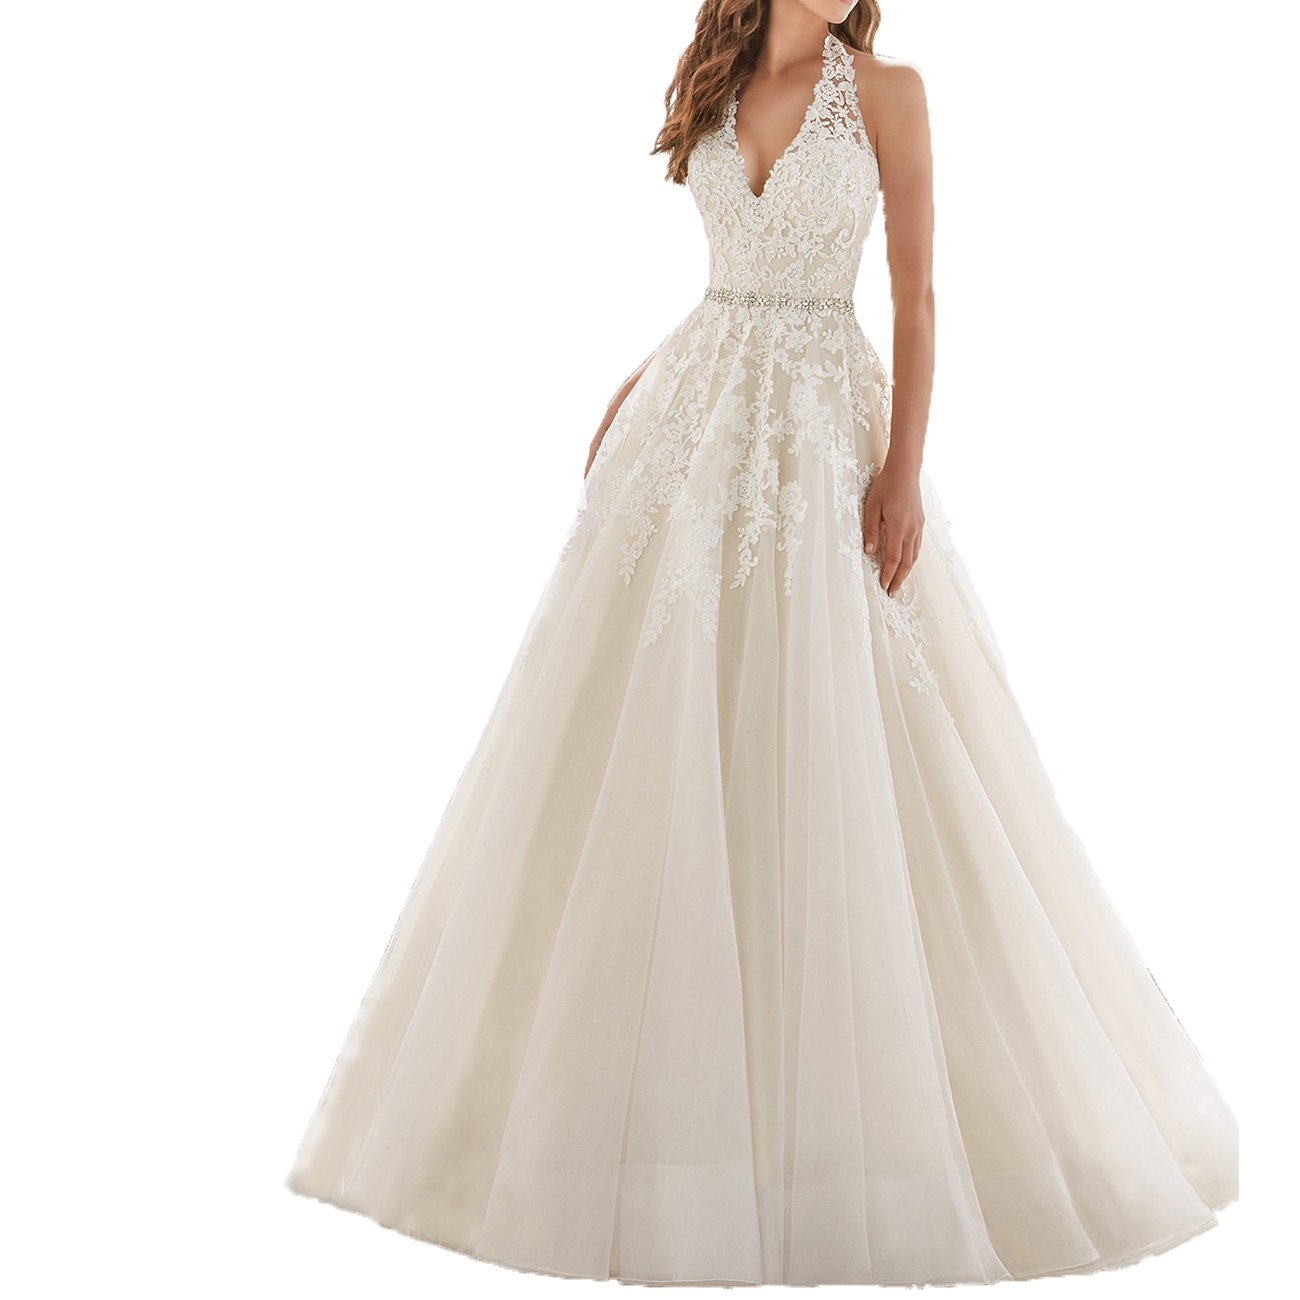 Westcorler Bridal Sleeveless Halter a-Line Wedding Dress Open Low Back Chapel Train (us10, White)